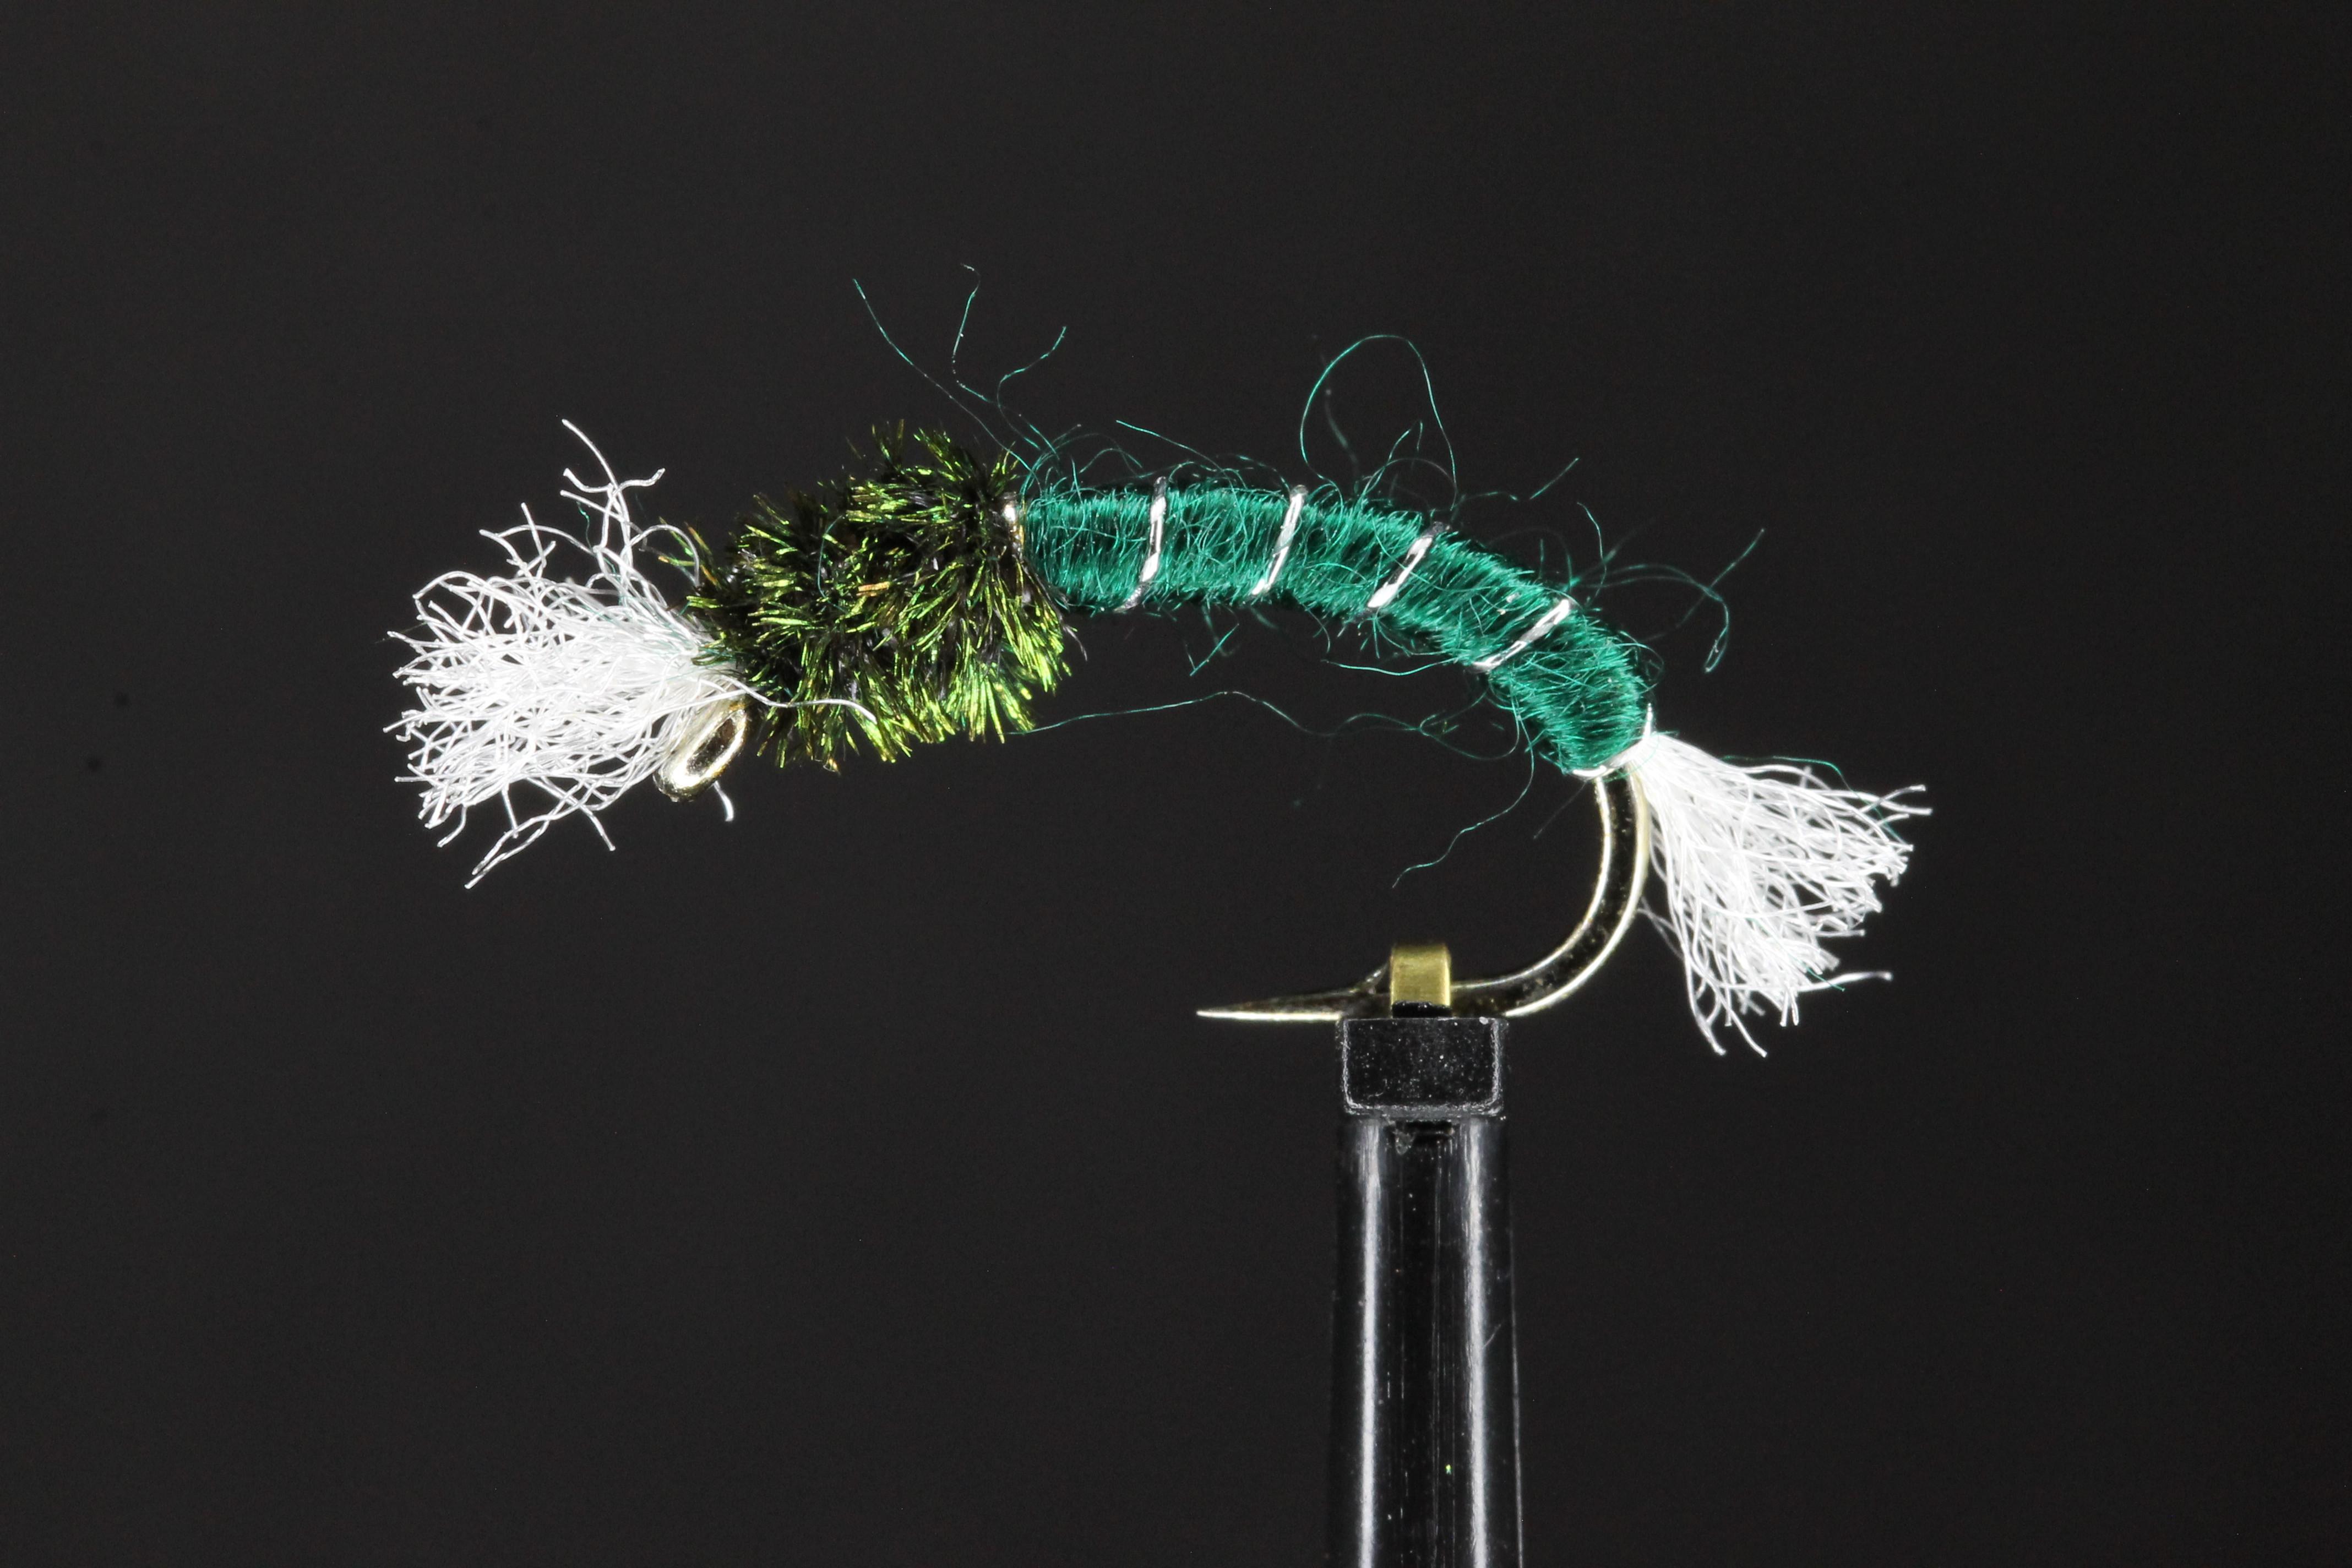 Green Standard Thoraxed (Shipmans) Buzzer